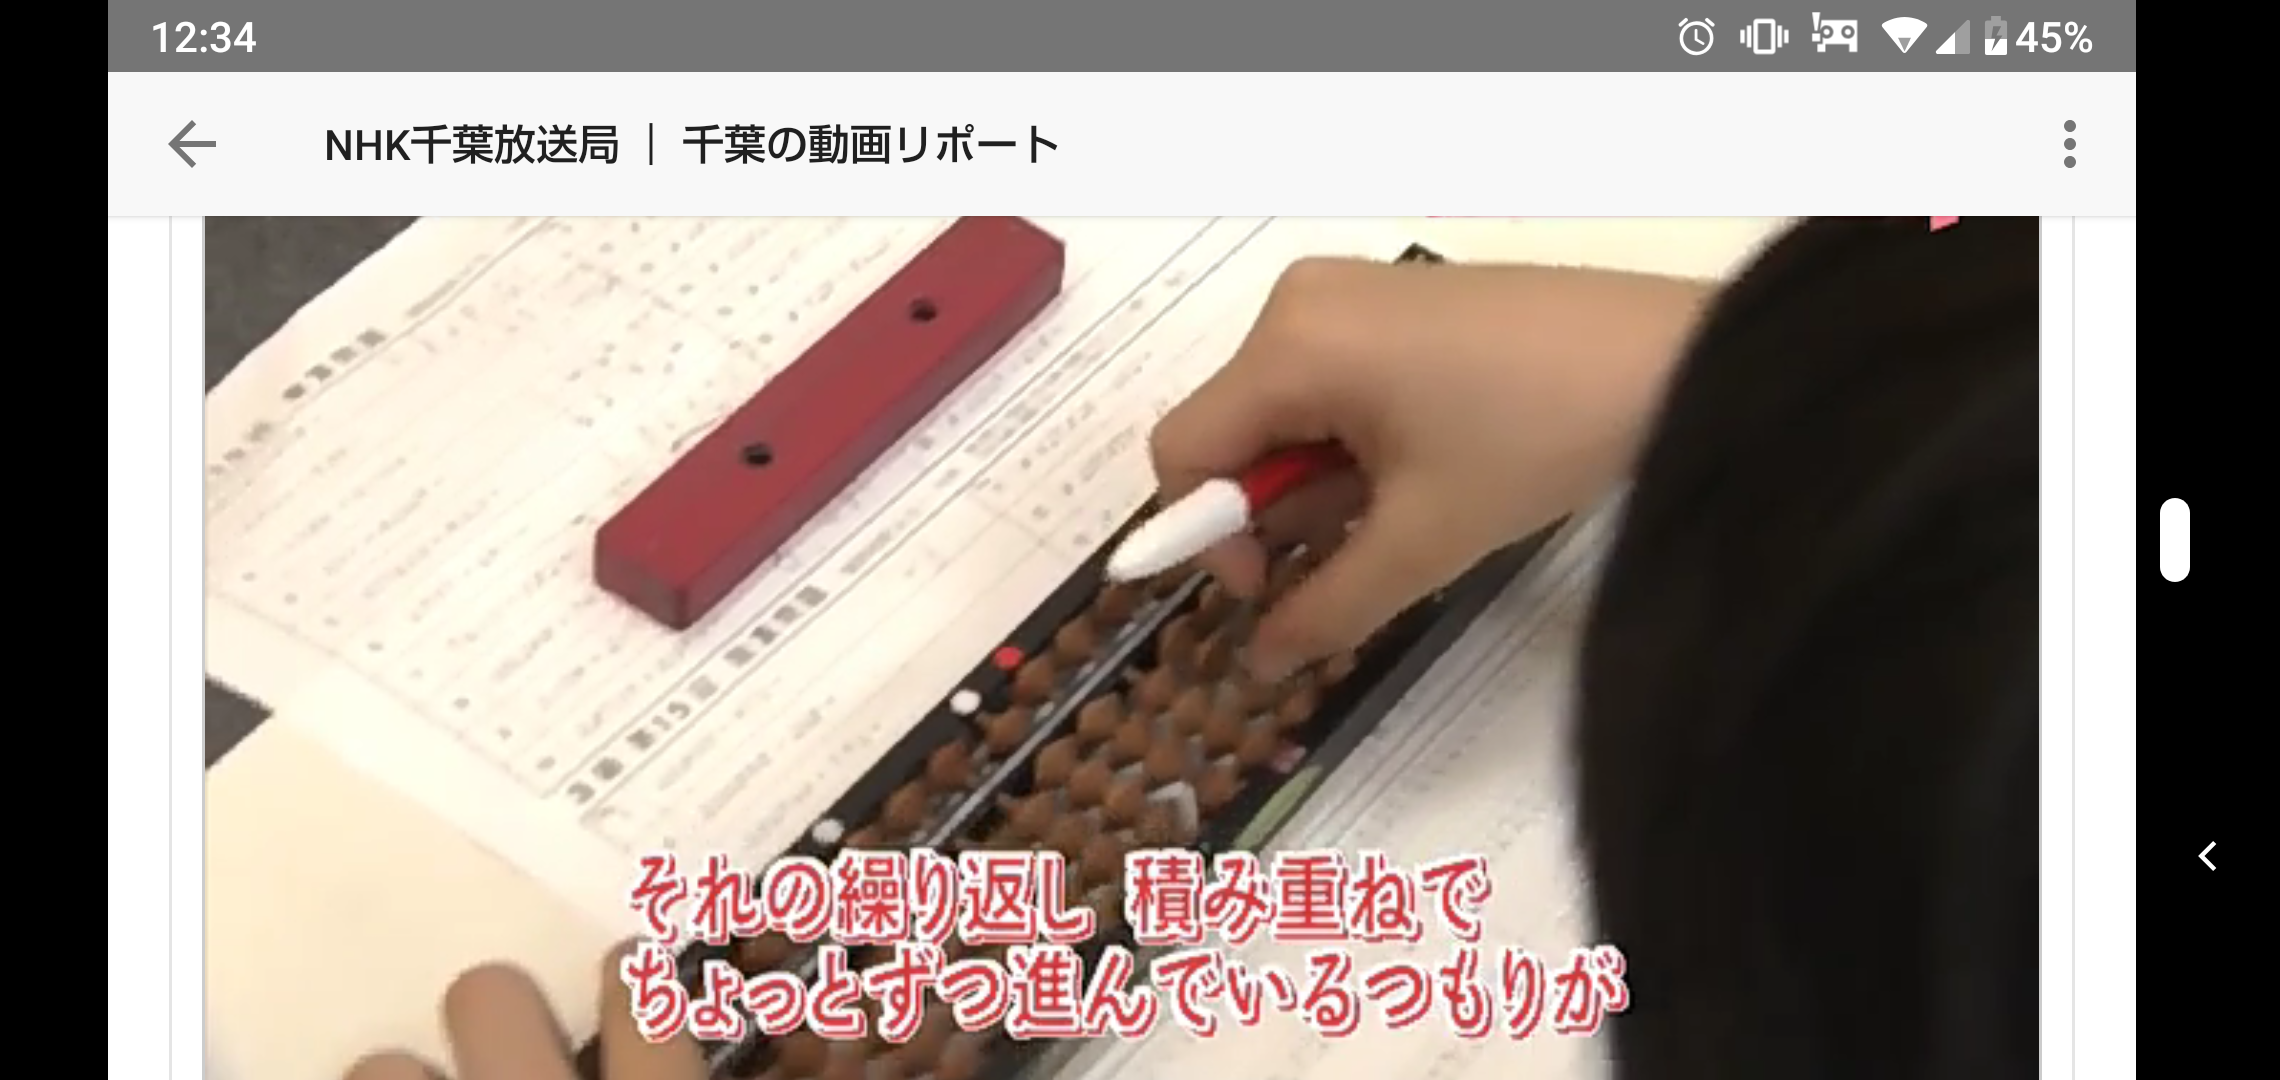 NHKでいしどのオンライン授業が特集されました!